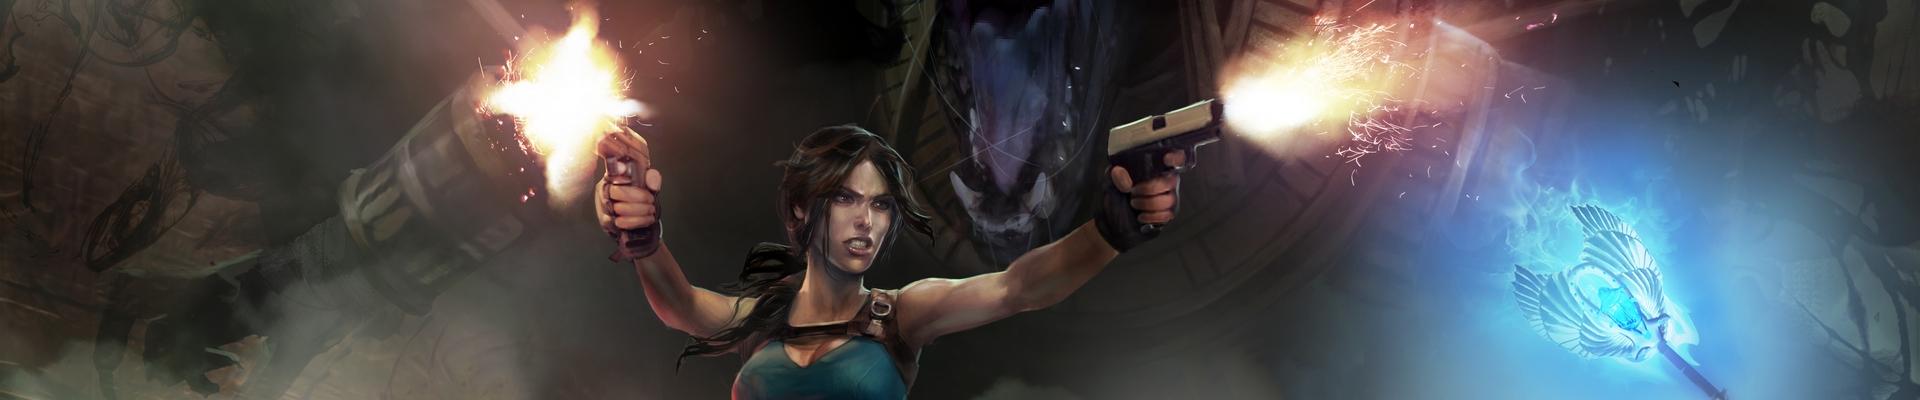 Image de l'article E3 2014 – Lara Croft and the Temple of Osiris